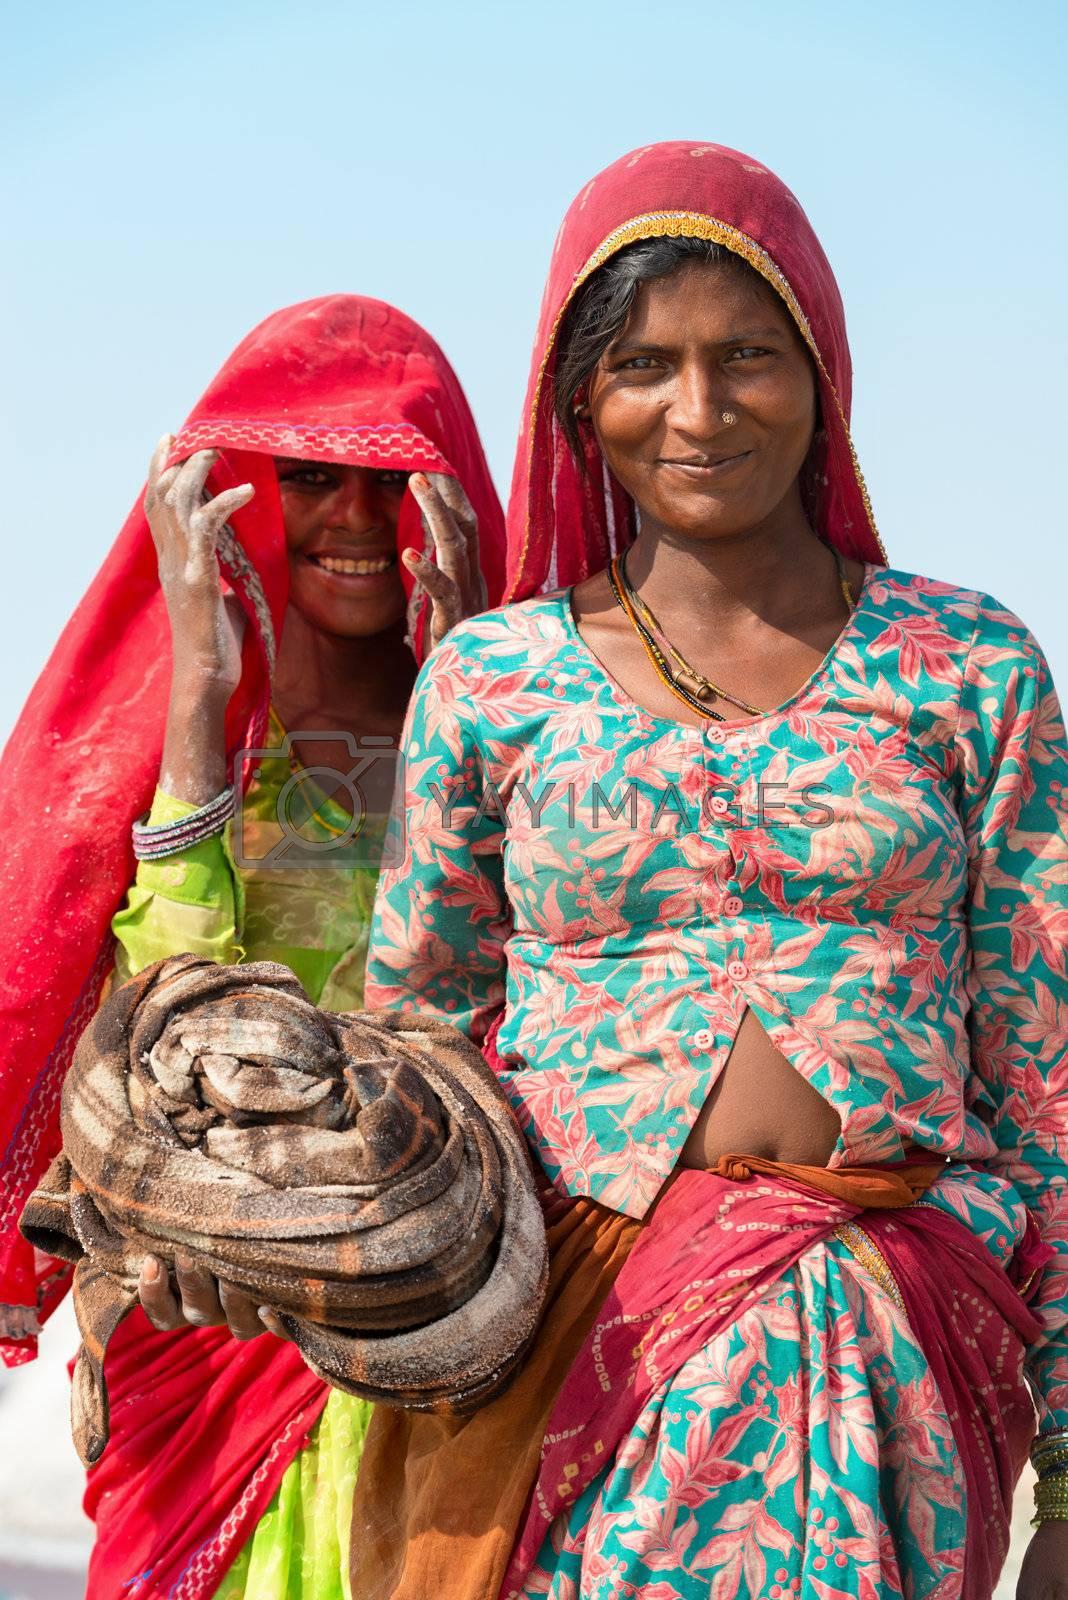 Sambhar, India - Nov 19: Portrait of indian female workers in salt farm on Nov 19, 2012 in Sambhar Salt Lake, India. It is India's largest saline lake and where salt has been farmed for a thousand years.